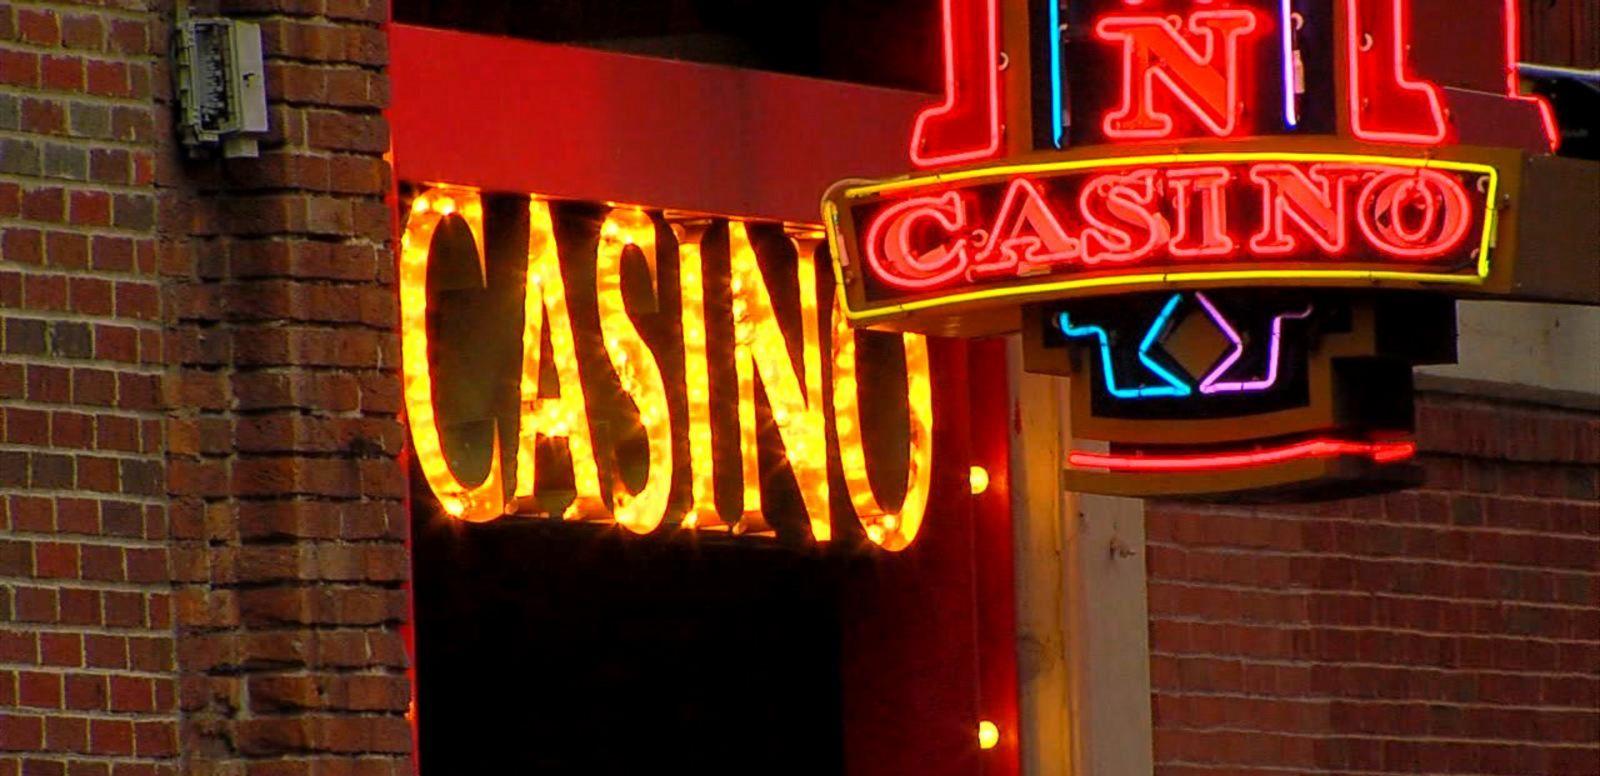 VIDEO: Thief Steals Half-Million Dollars From Detroit Casino